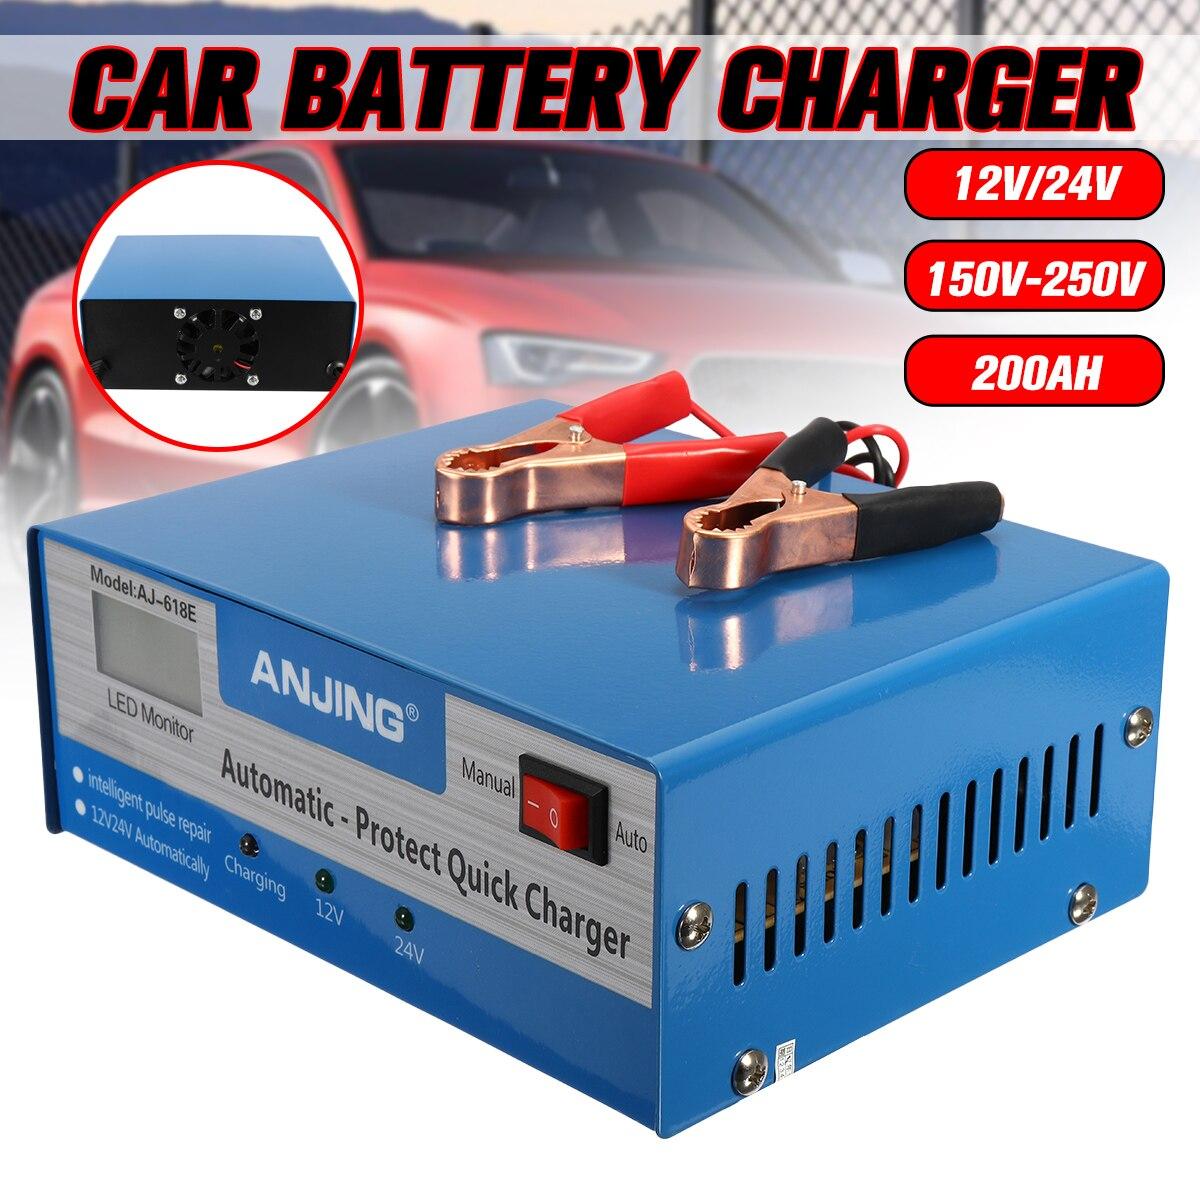 Car Battery Charger Lead Acid Battery 12V/24V 150V 250V 200AH PWM US Applicable to Five Charging Modes Digital Pulse Repairing